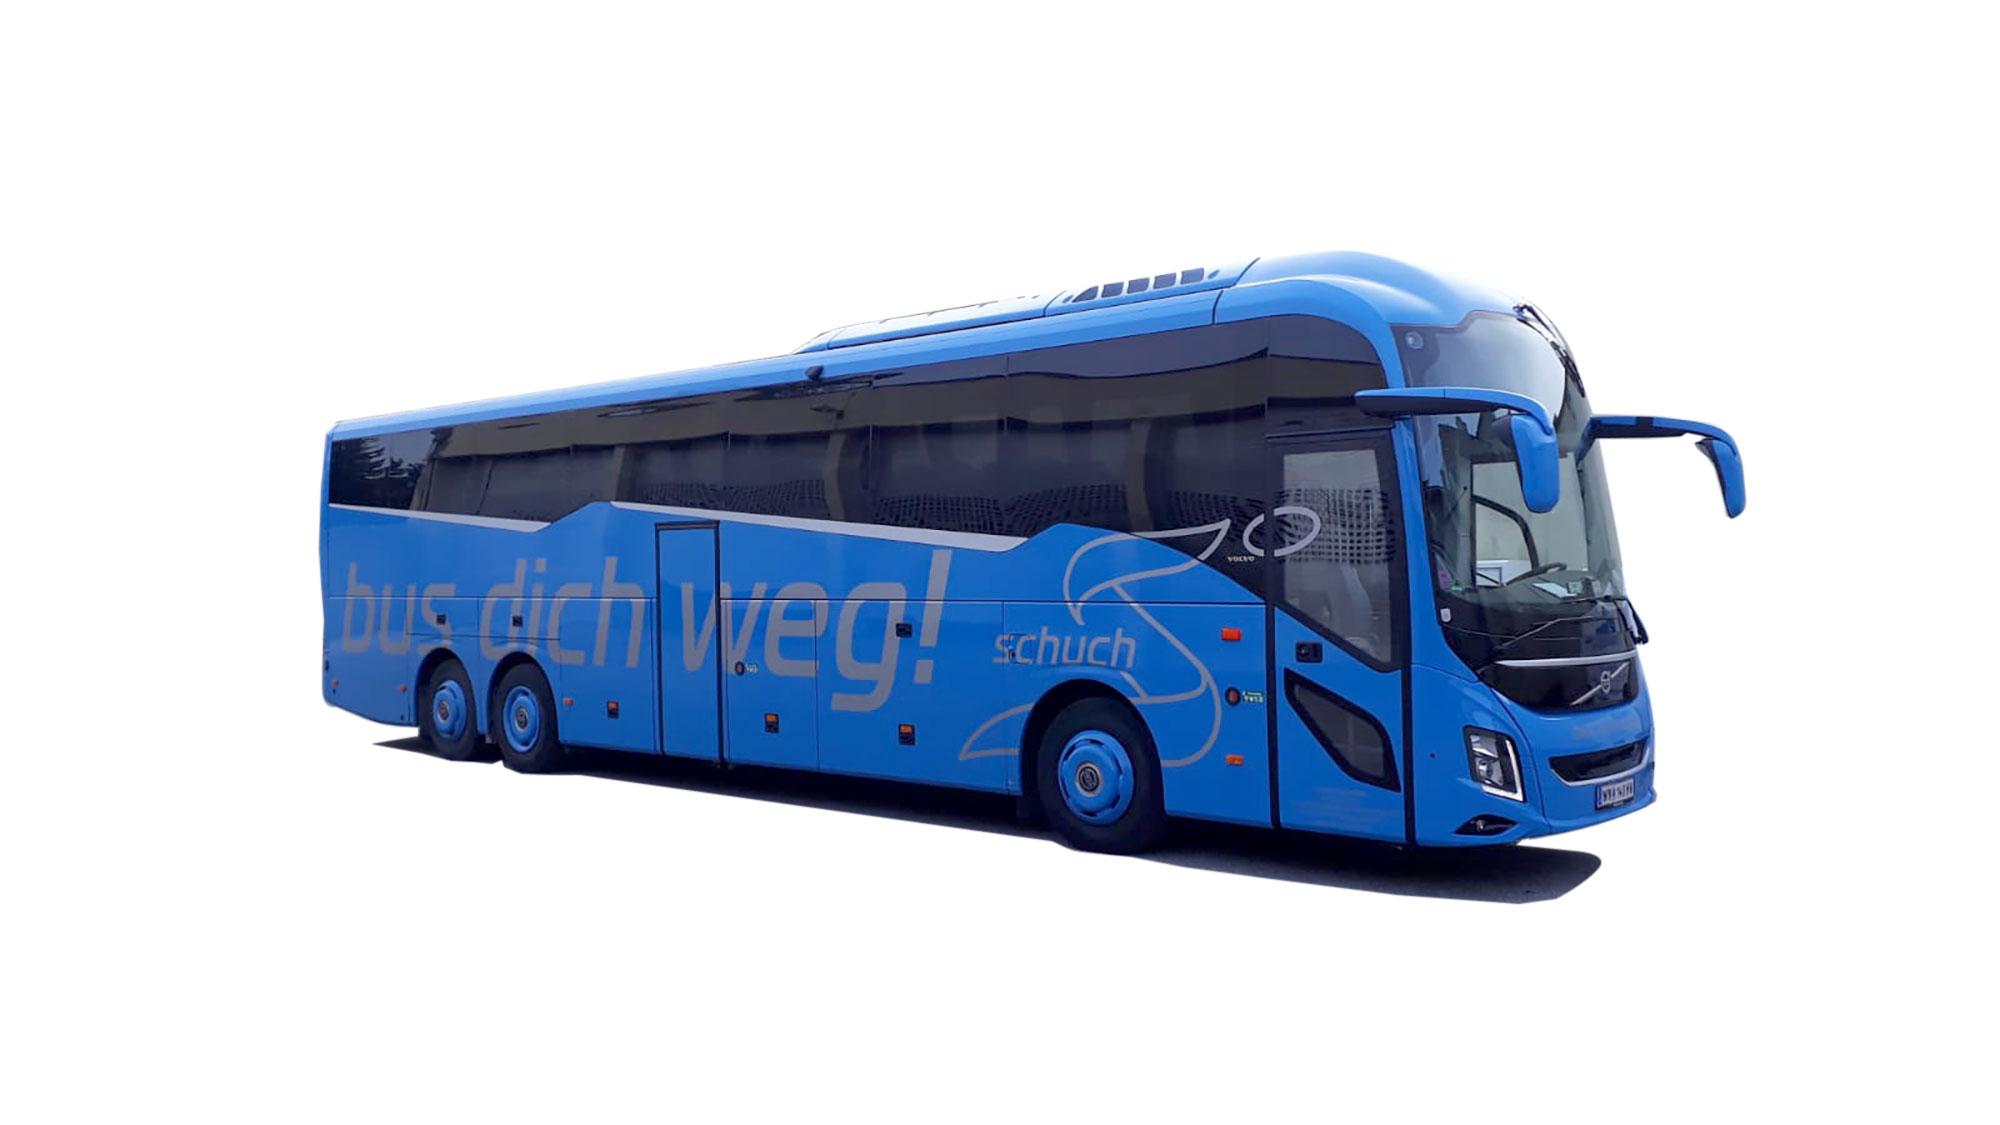 bus.bild.0.originalResource.alternative}